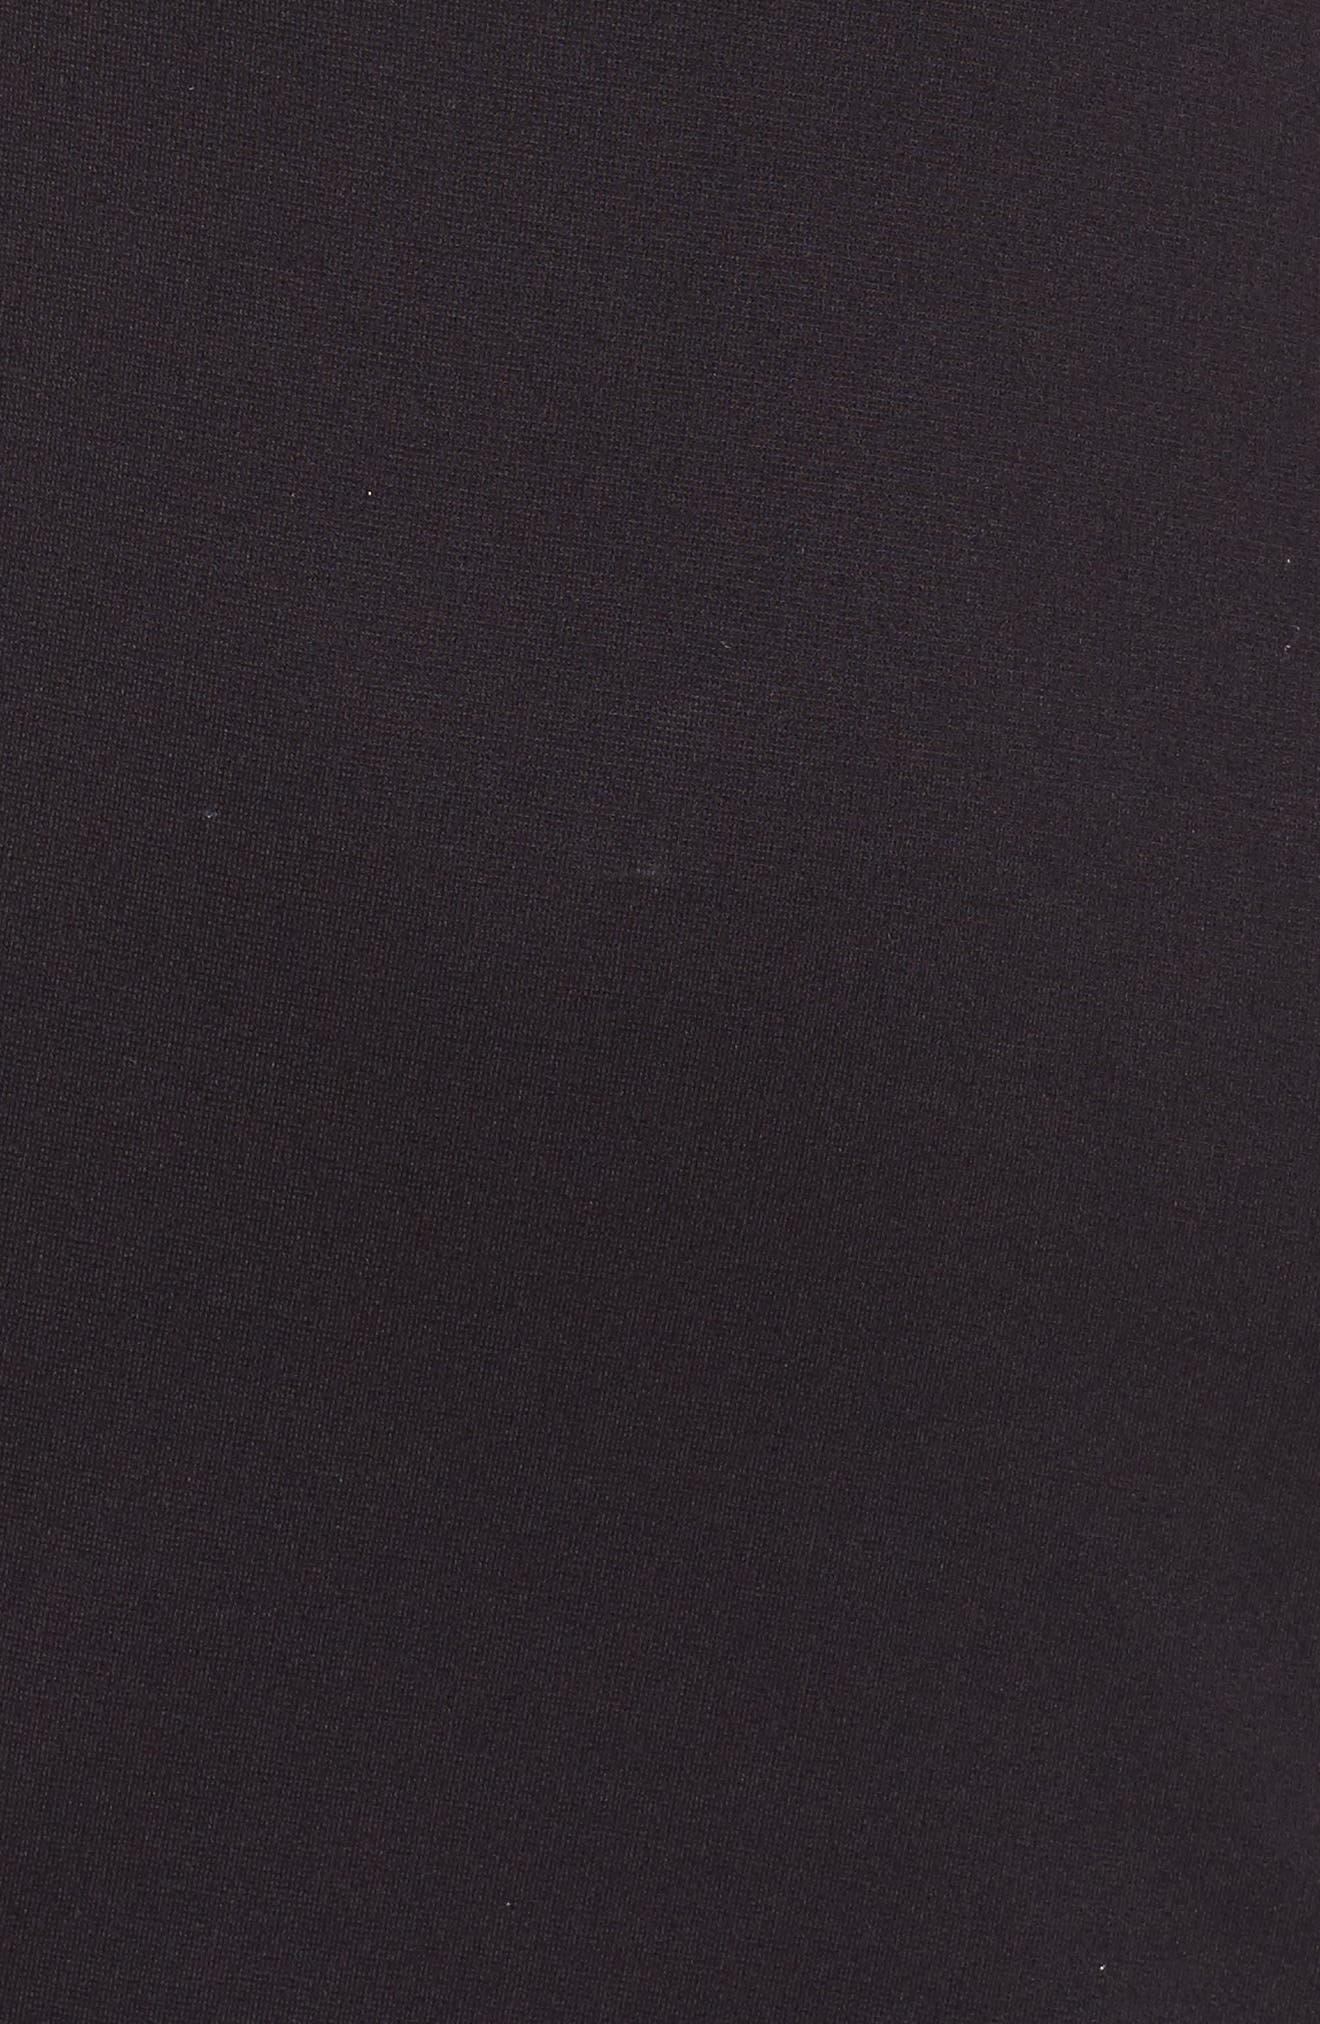 Flutter Sleeve Sheath Dress,                             Alternate thumbnail 5, color,                             Black